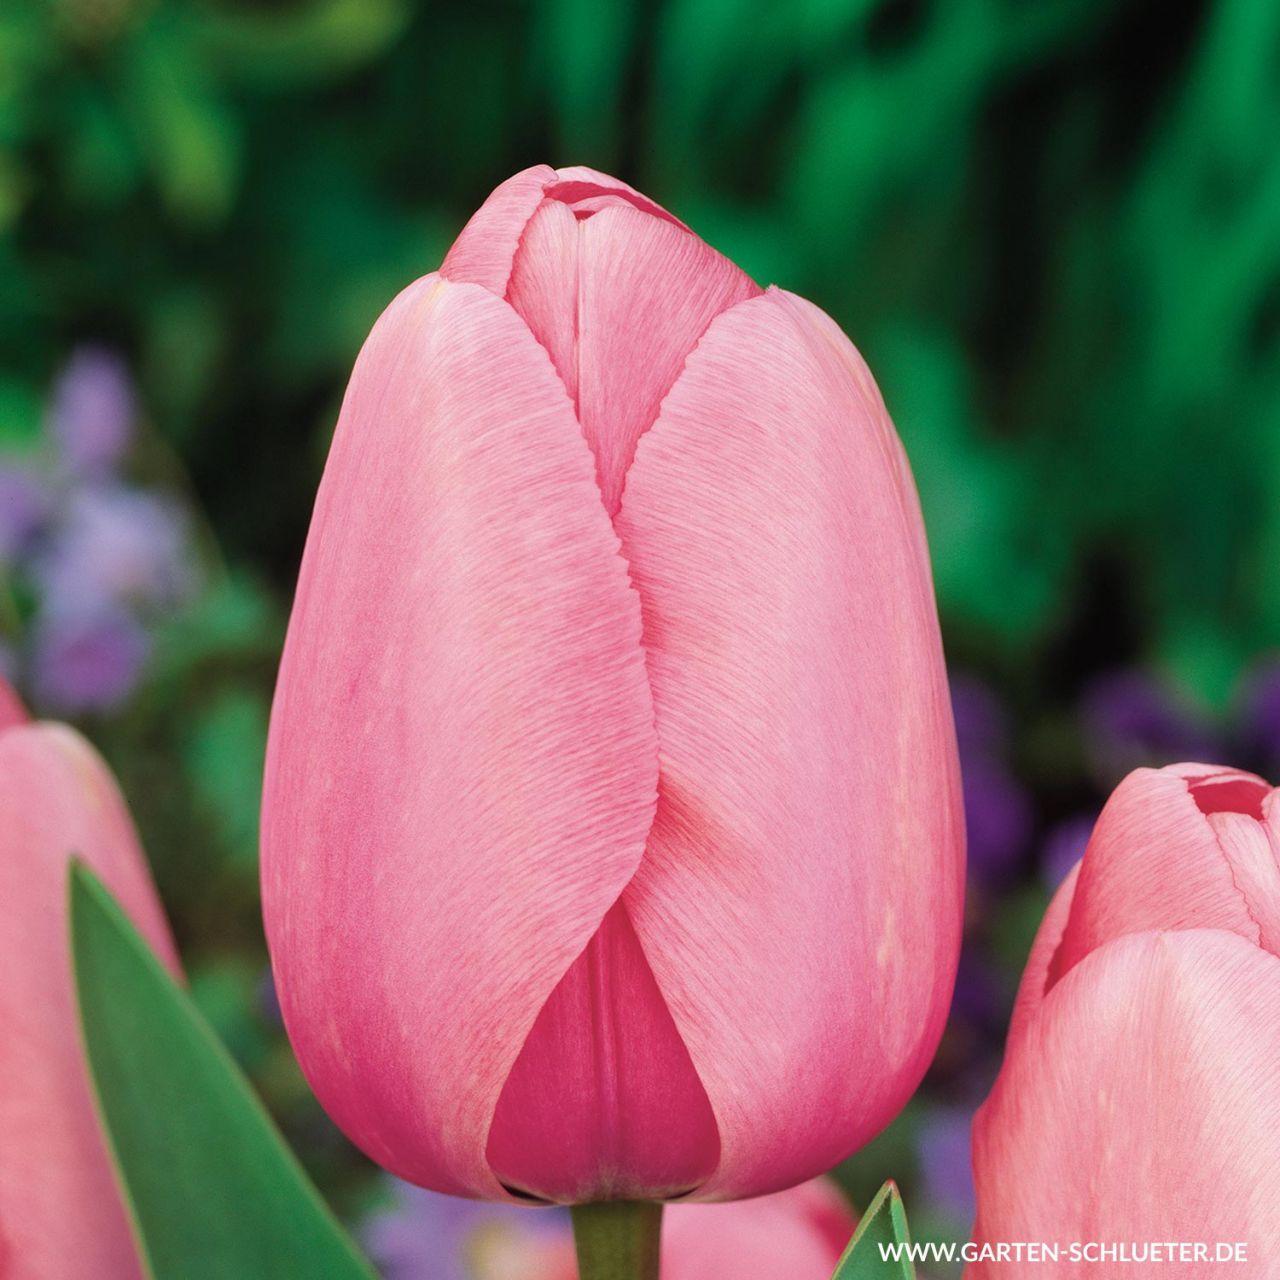 Garten-Schlueter.de: Darwin - Hybrid Tulpe Pink Impression - 10 Stück